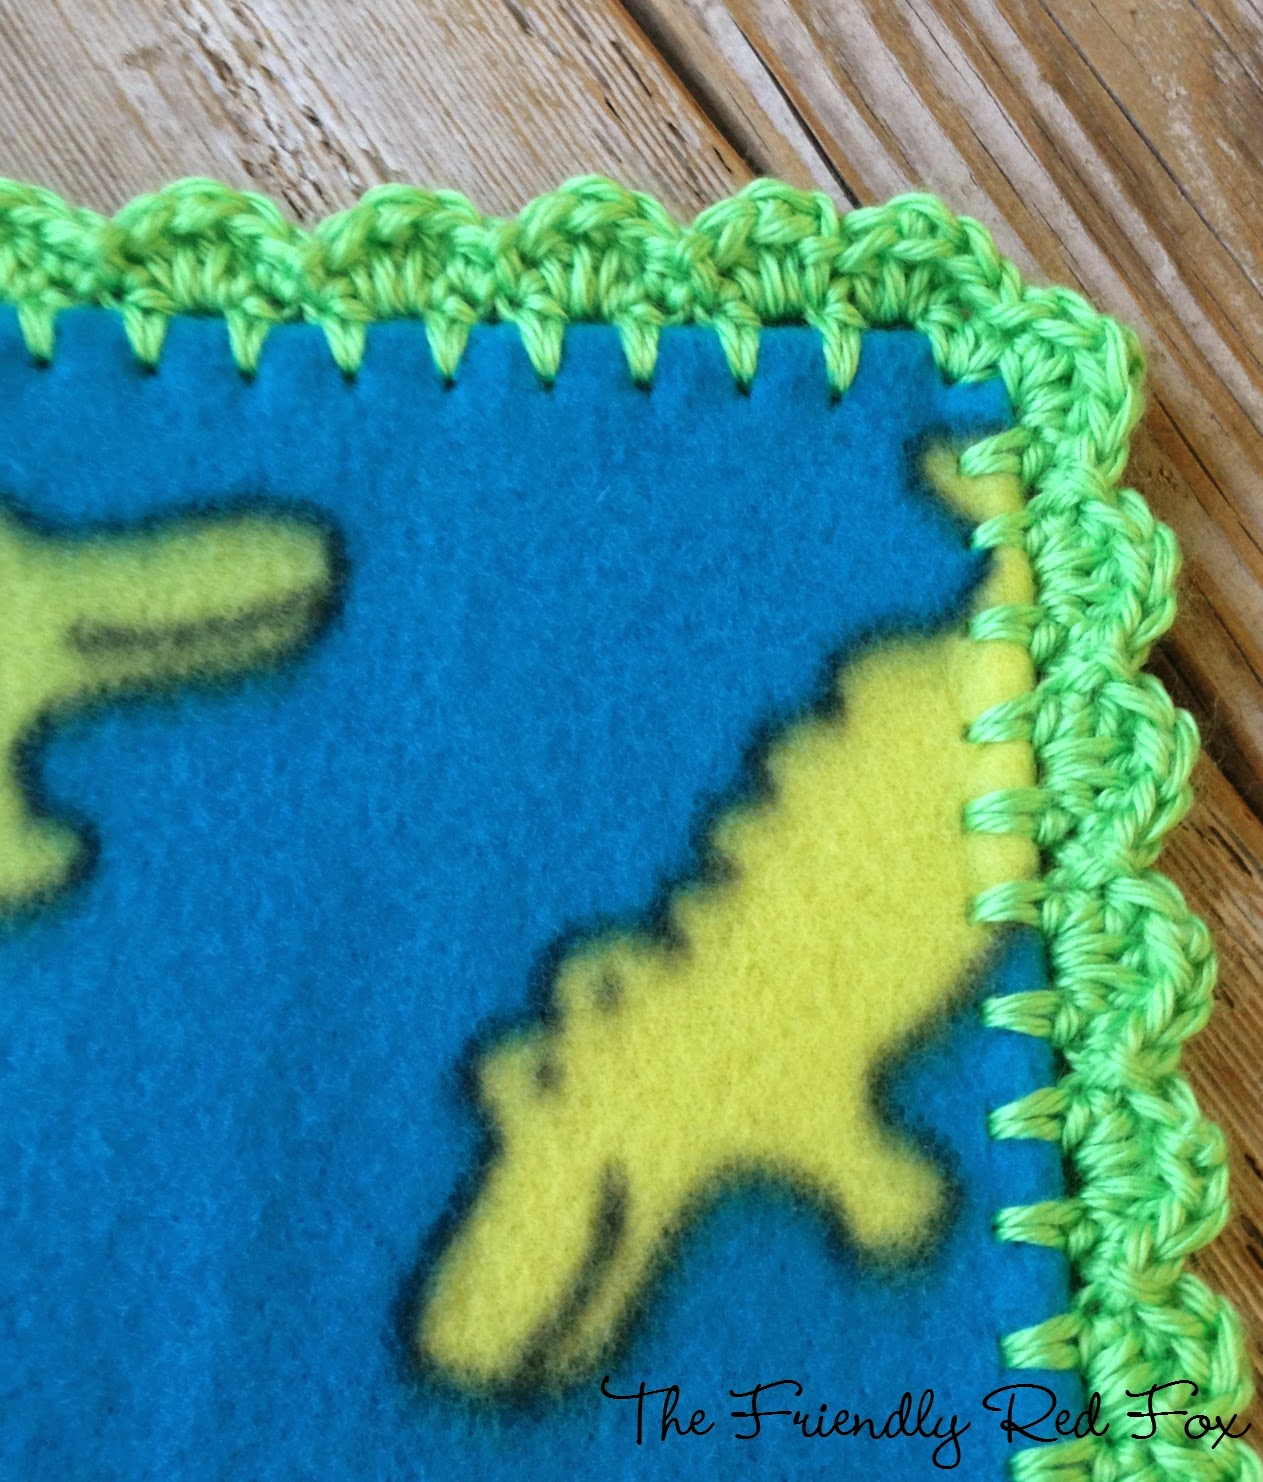 Crochet Edge on Fleece Blanket Tutorial - thefriendlyredfox.com 5bce21bd4